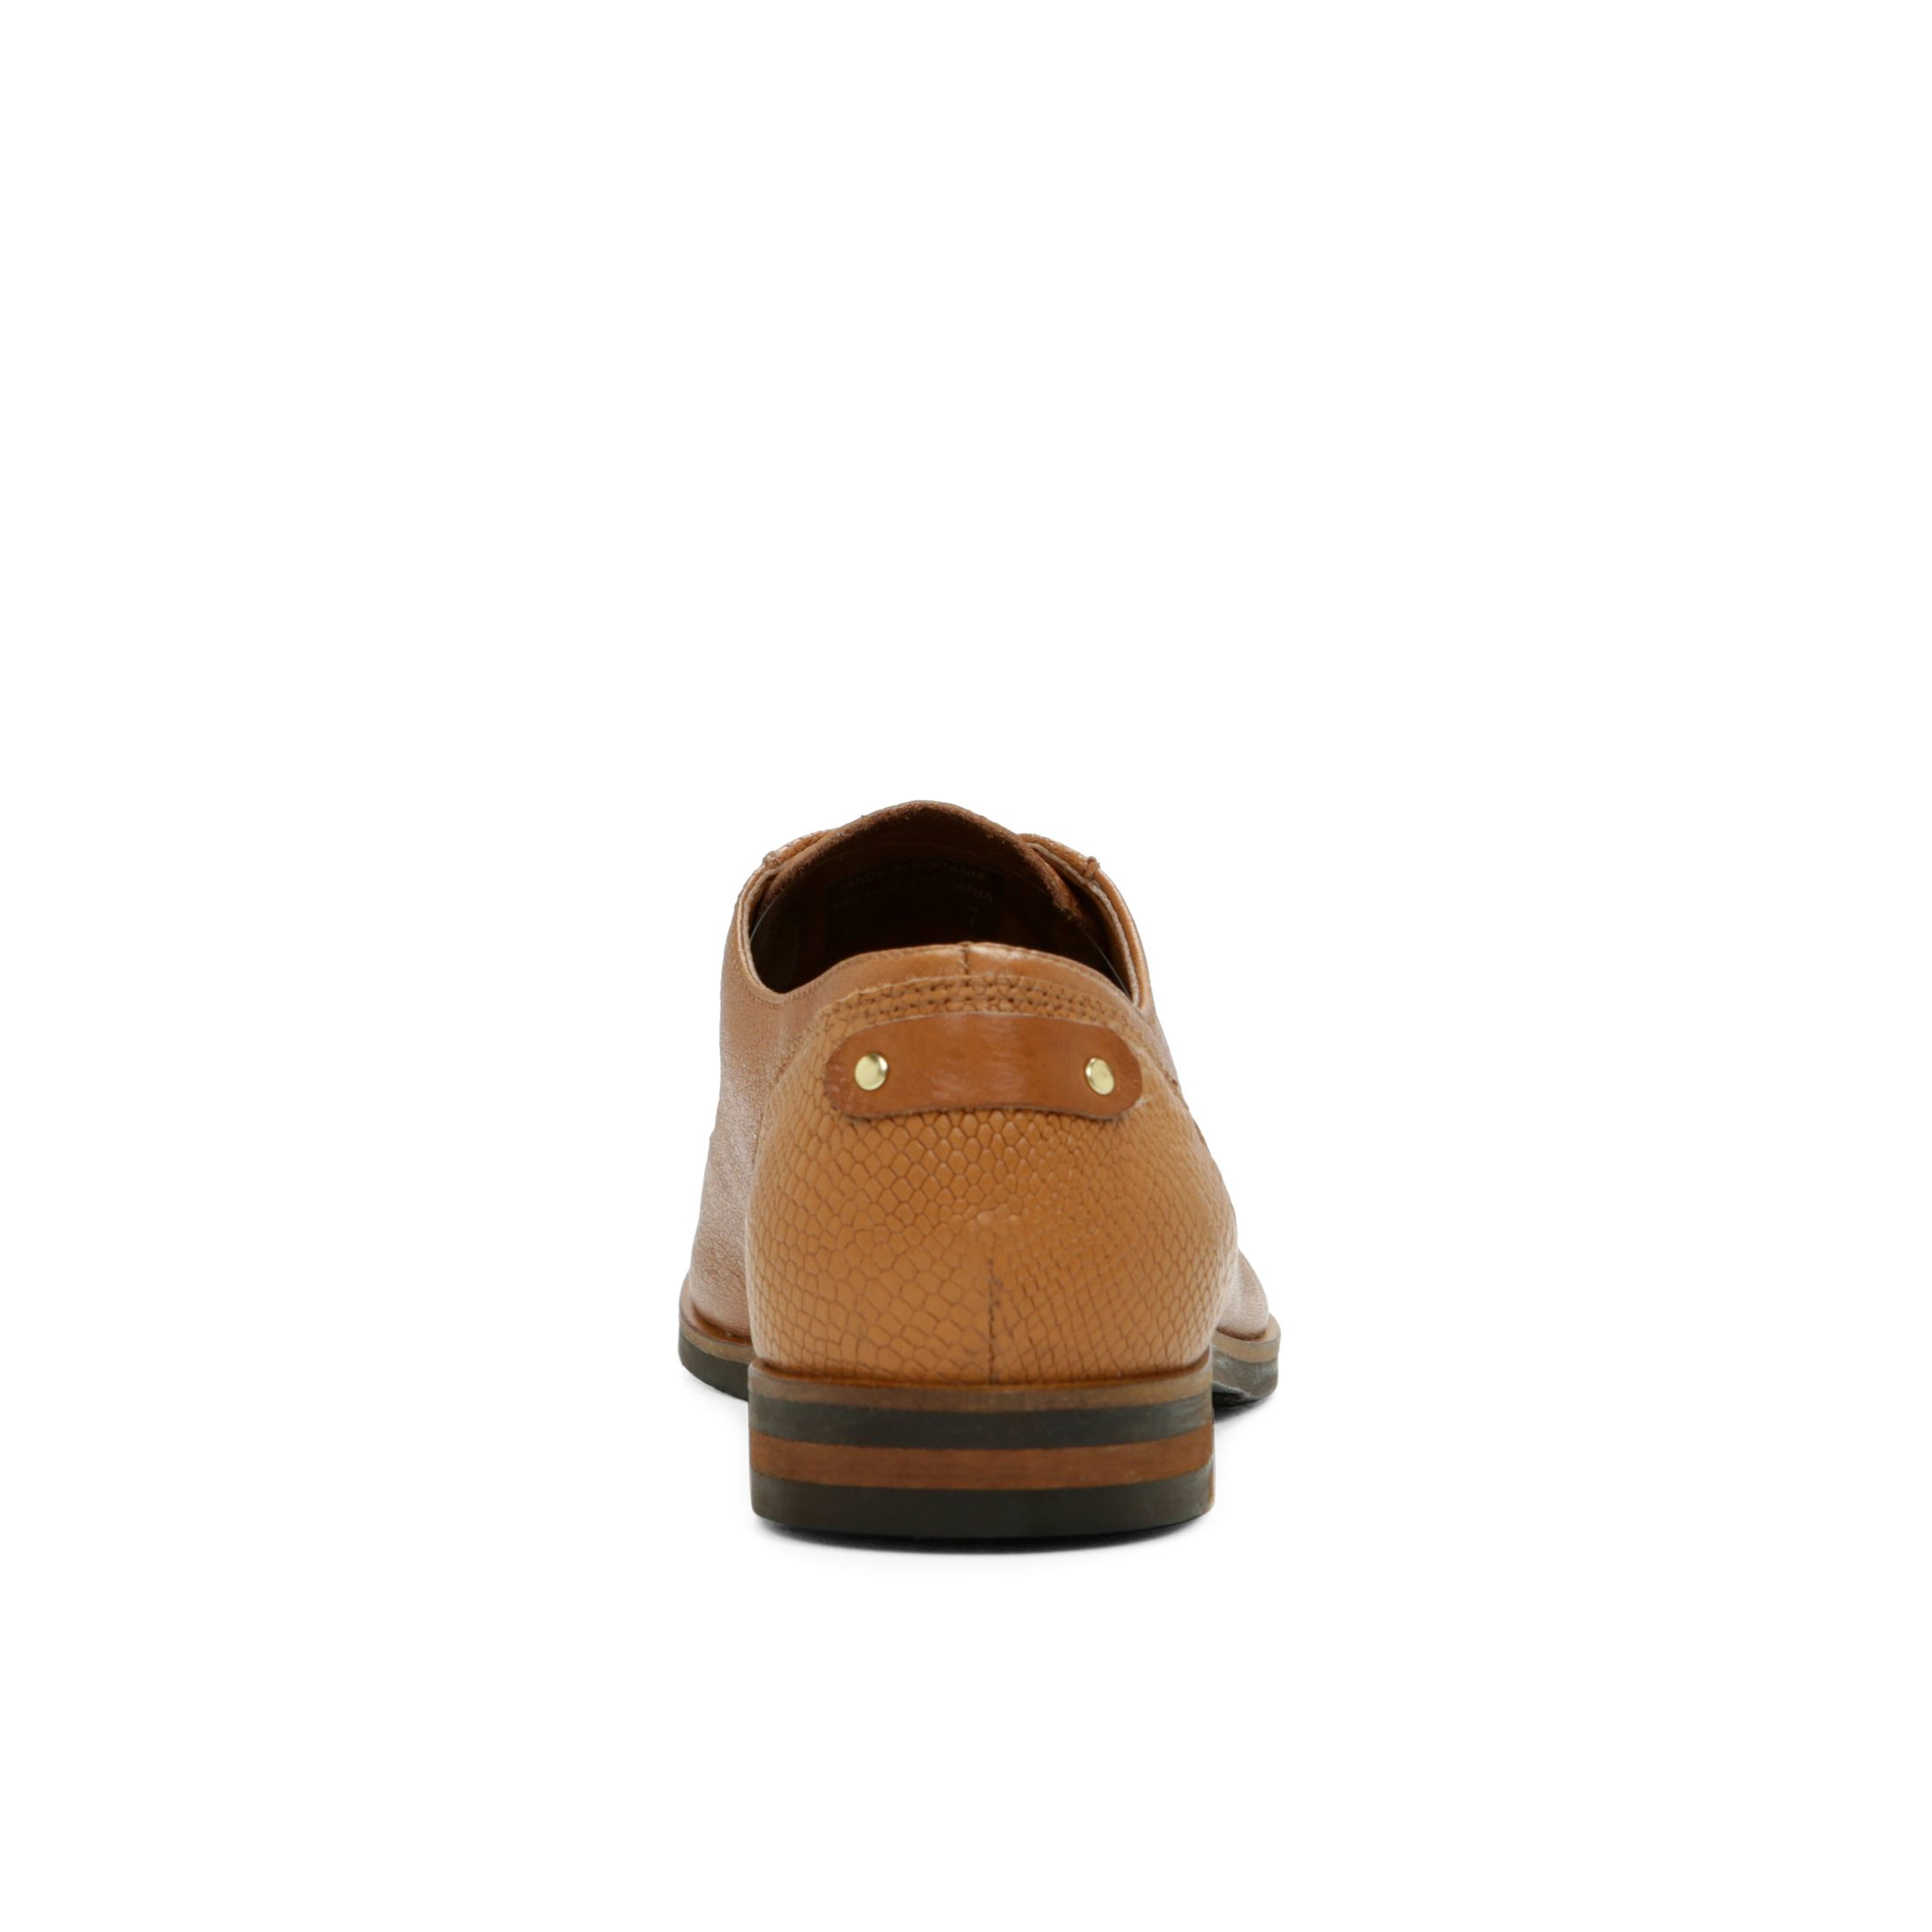 ALDO Leather Piuma Almond Toe Brogues in Cognac (Brown) for Men